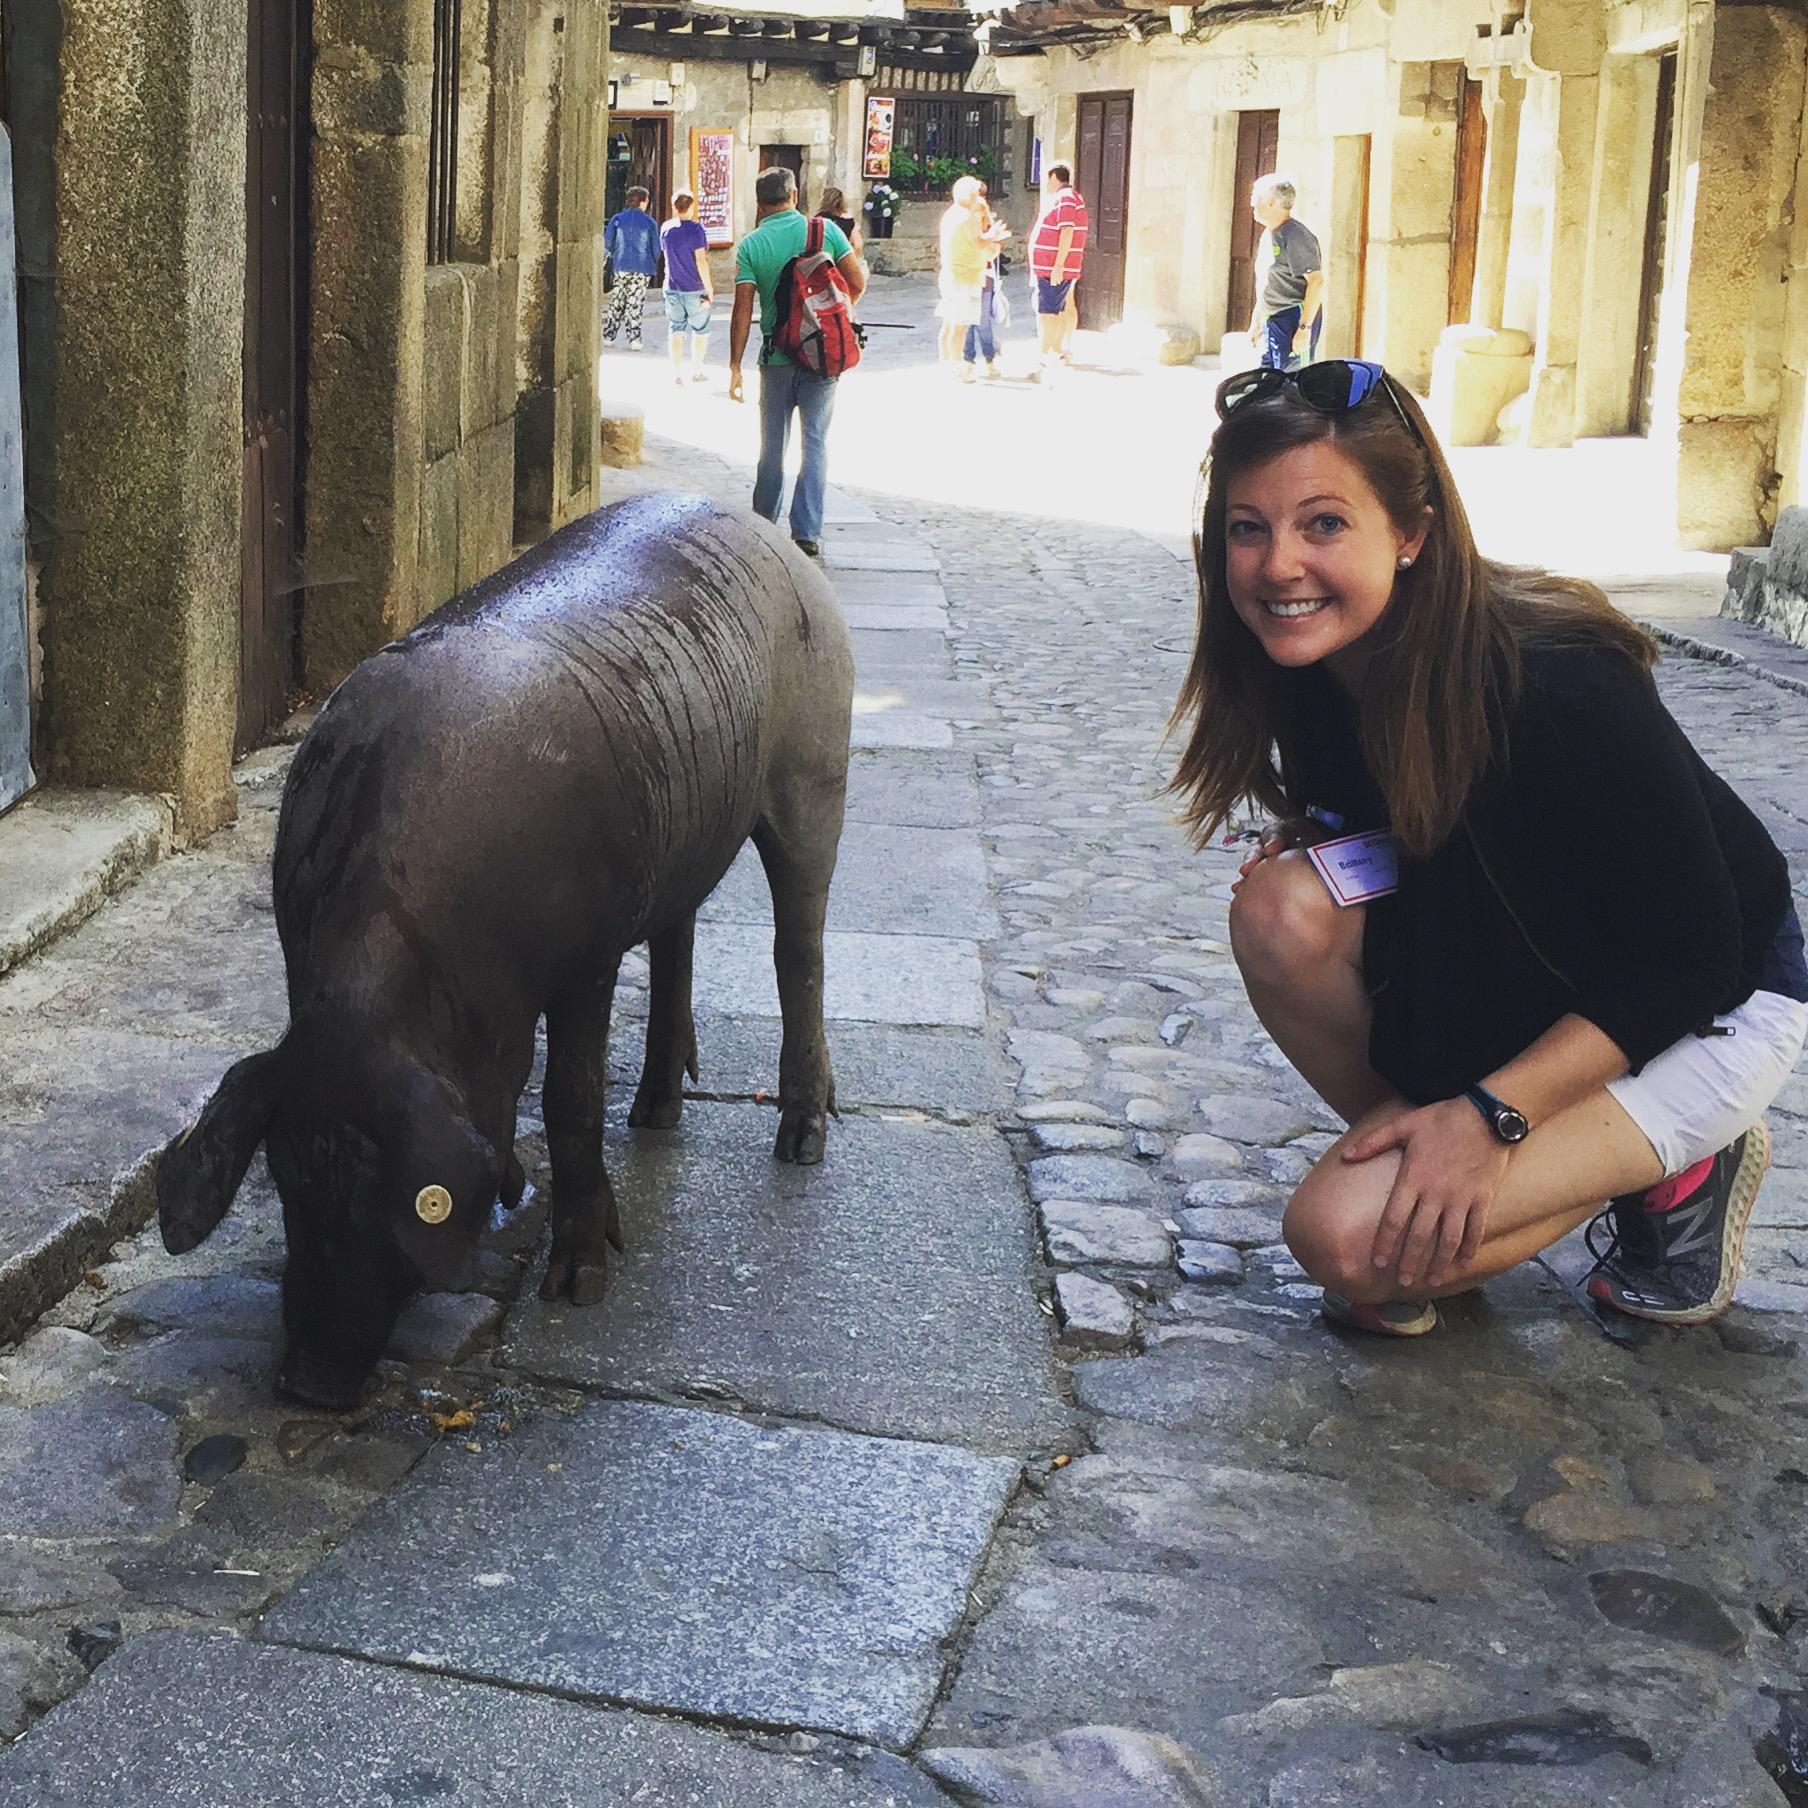 La Alberca pig www.thesweetwanderlust.com